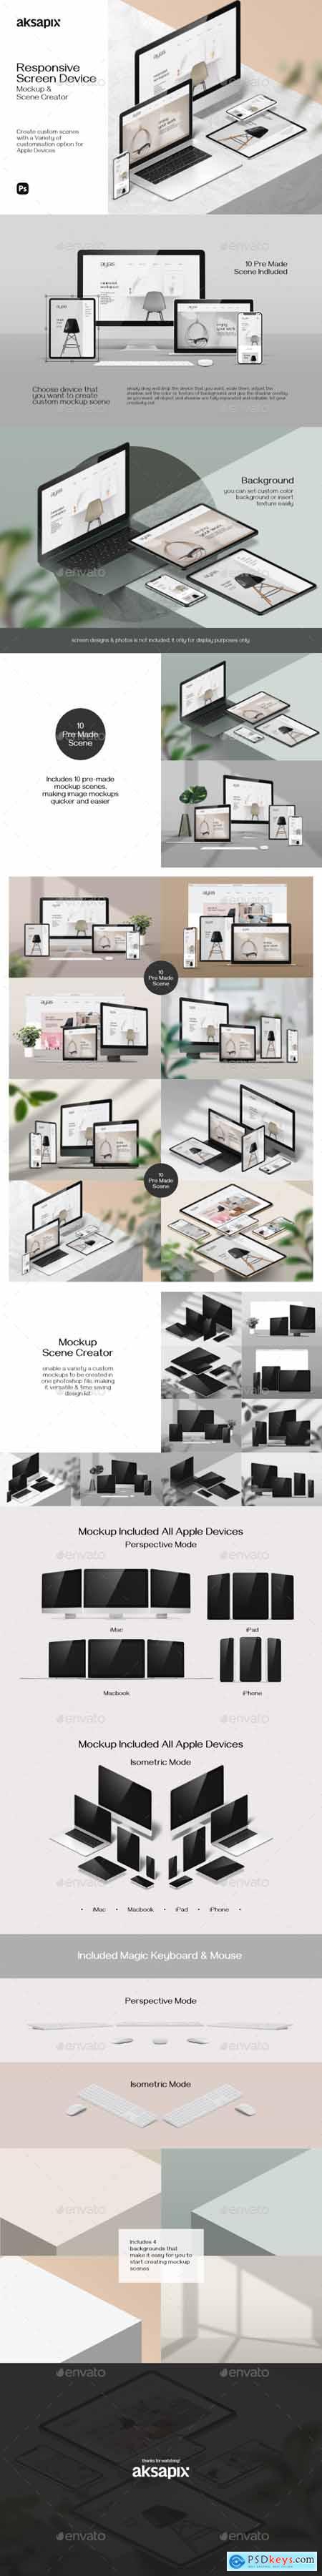 Responsive Screen Device - Mockup Scene Creator 28497192